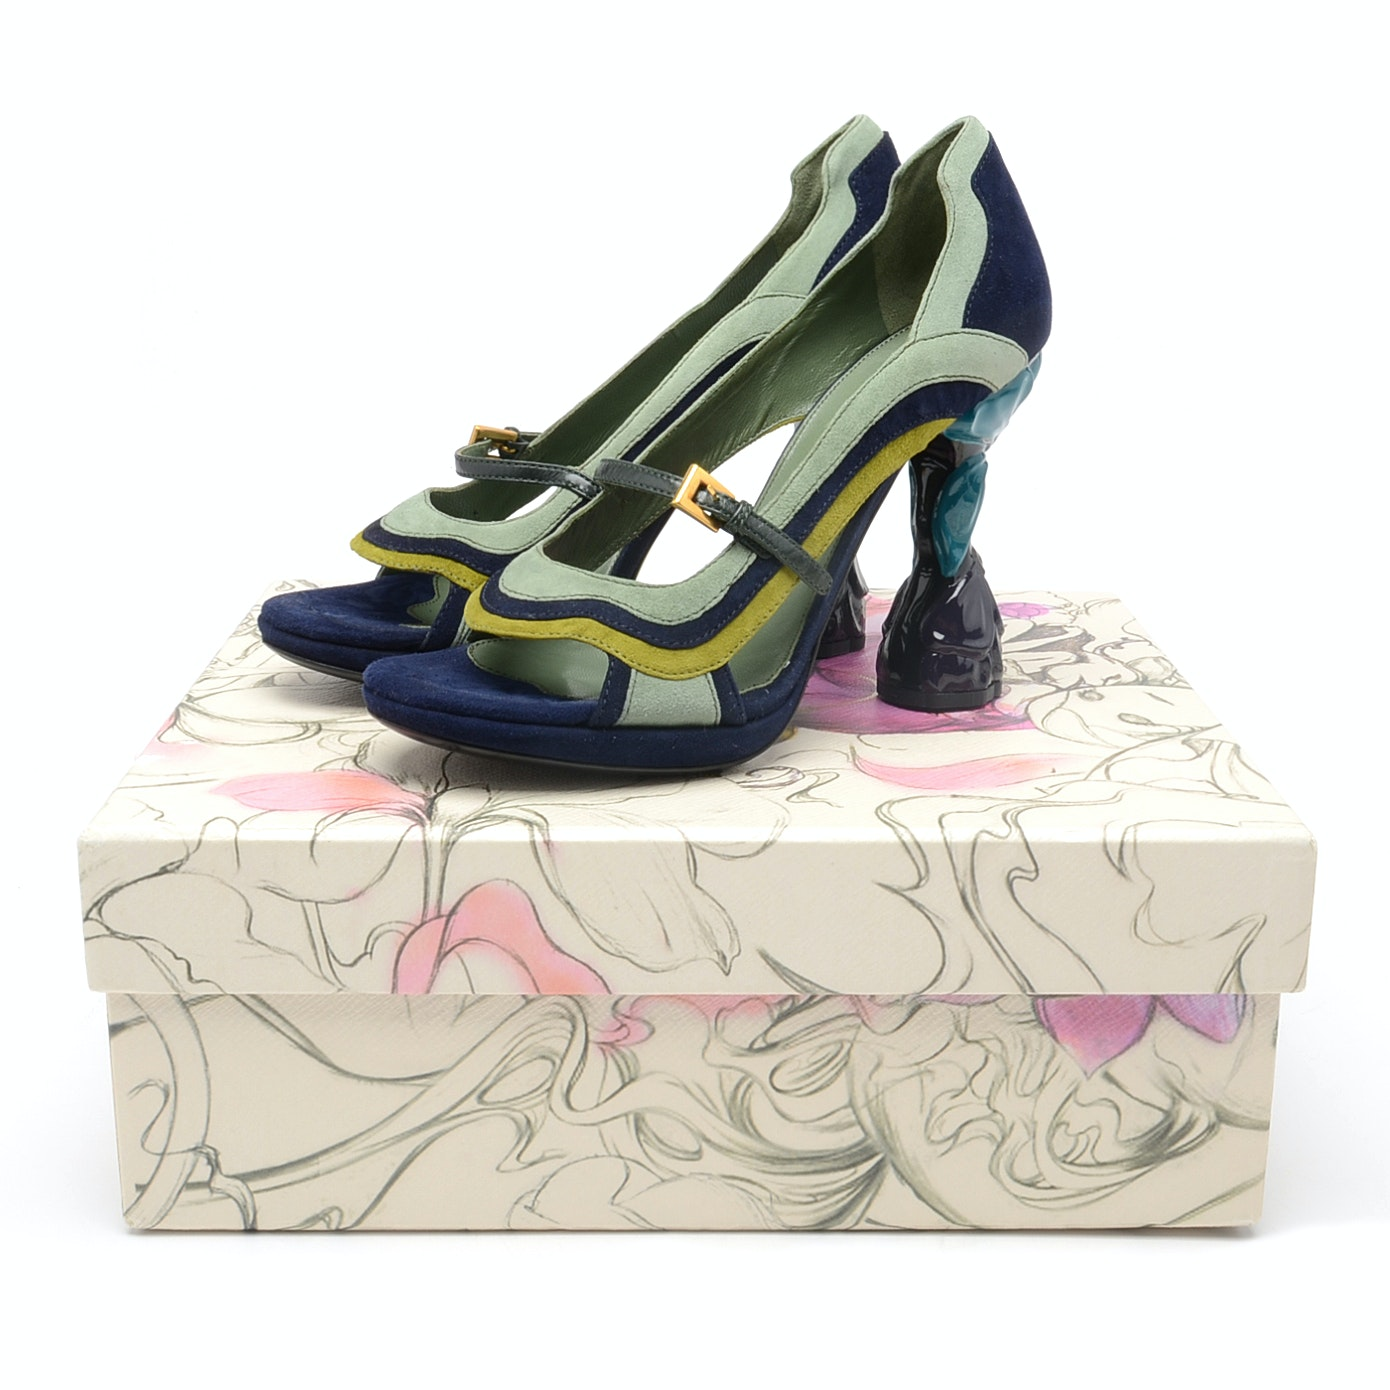 Prada 2007 Fairy Collection Suede Sculptural Heels